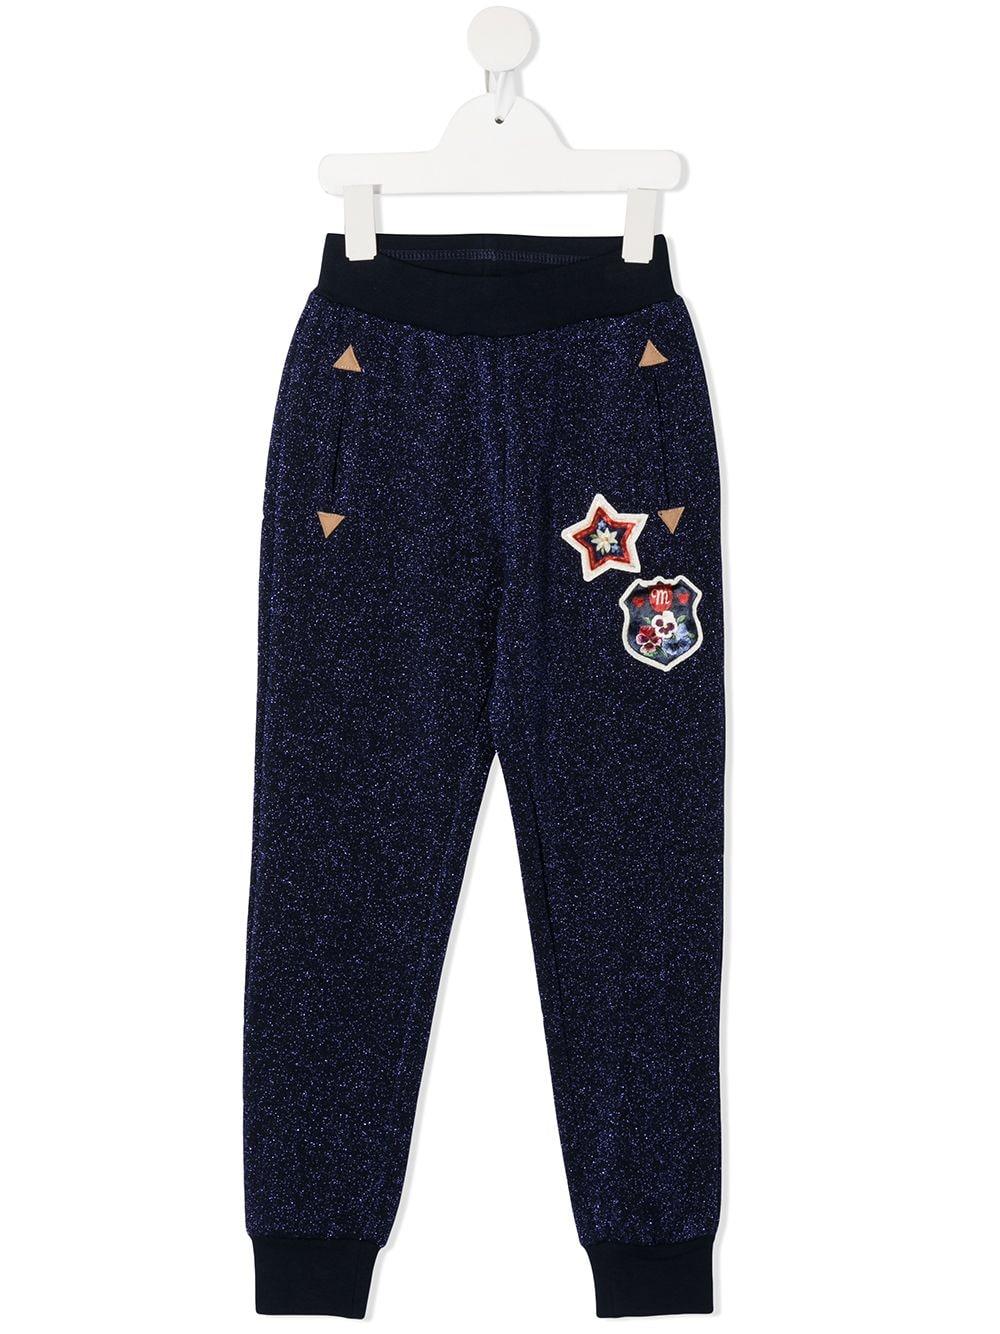 pantaloni in felpa con patch MONNALISA | Pantaloni | 196417AH60020056